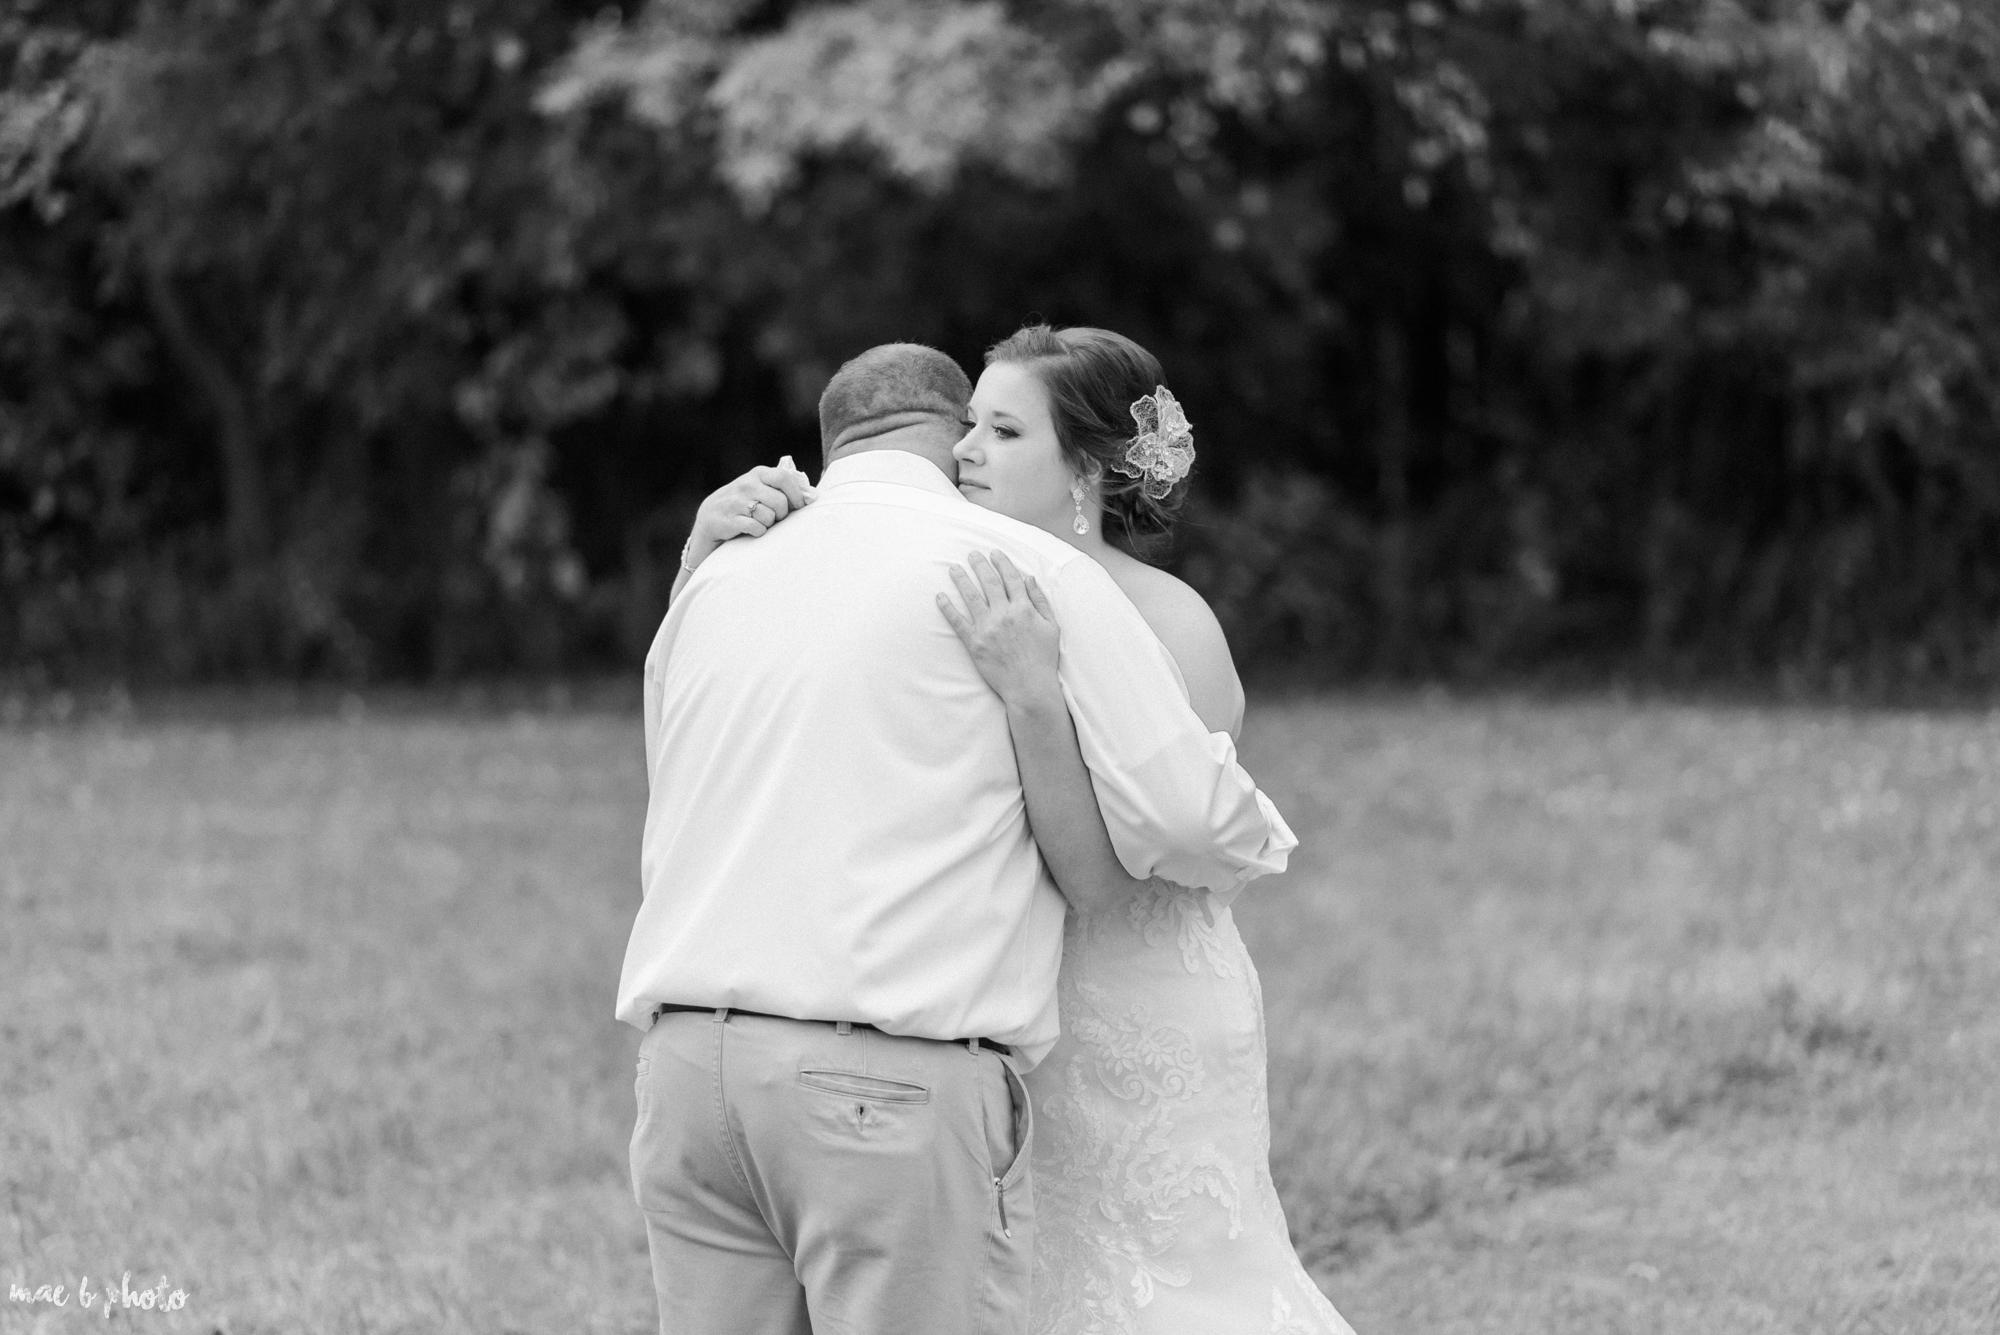 Sarah & Dustin's Rustic Chic Barn Wedding at Hartford Hill Winery in Hartford, Ohio by Mae B Photo-62.jpg